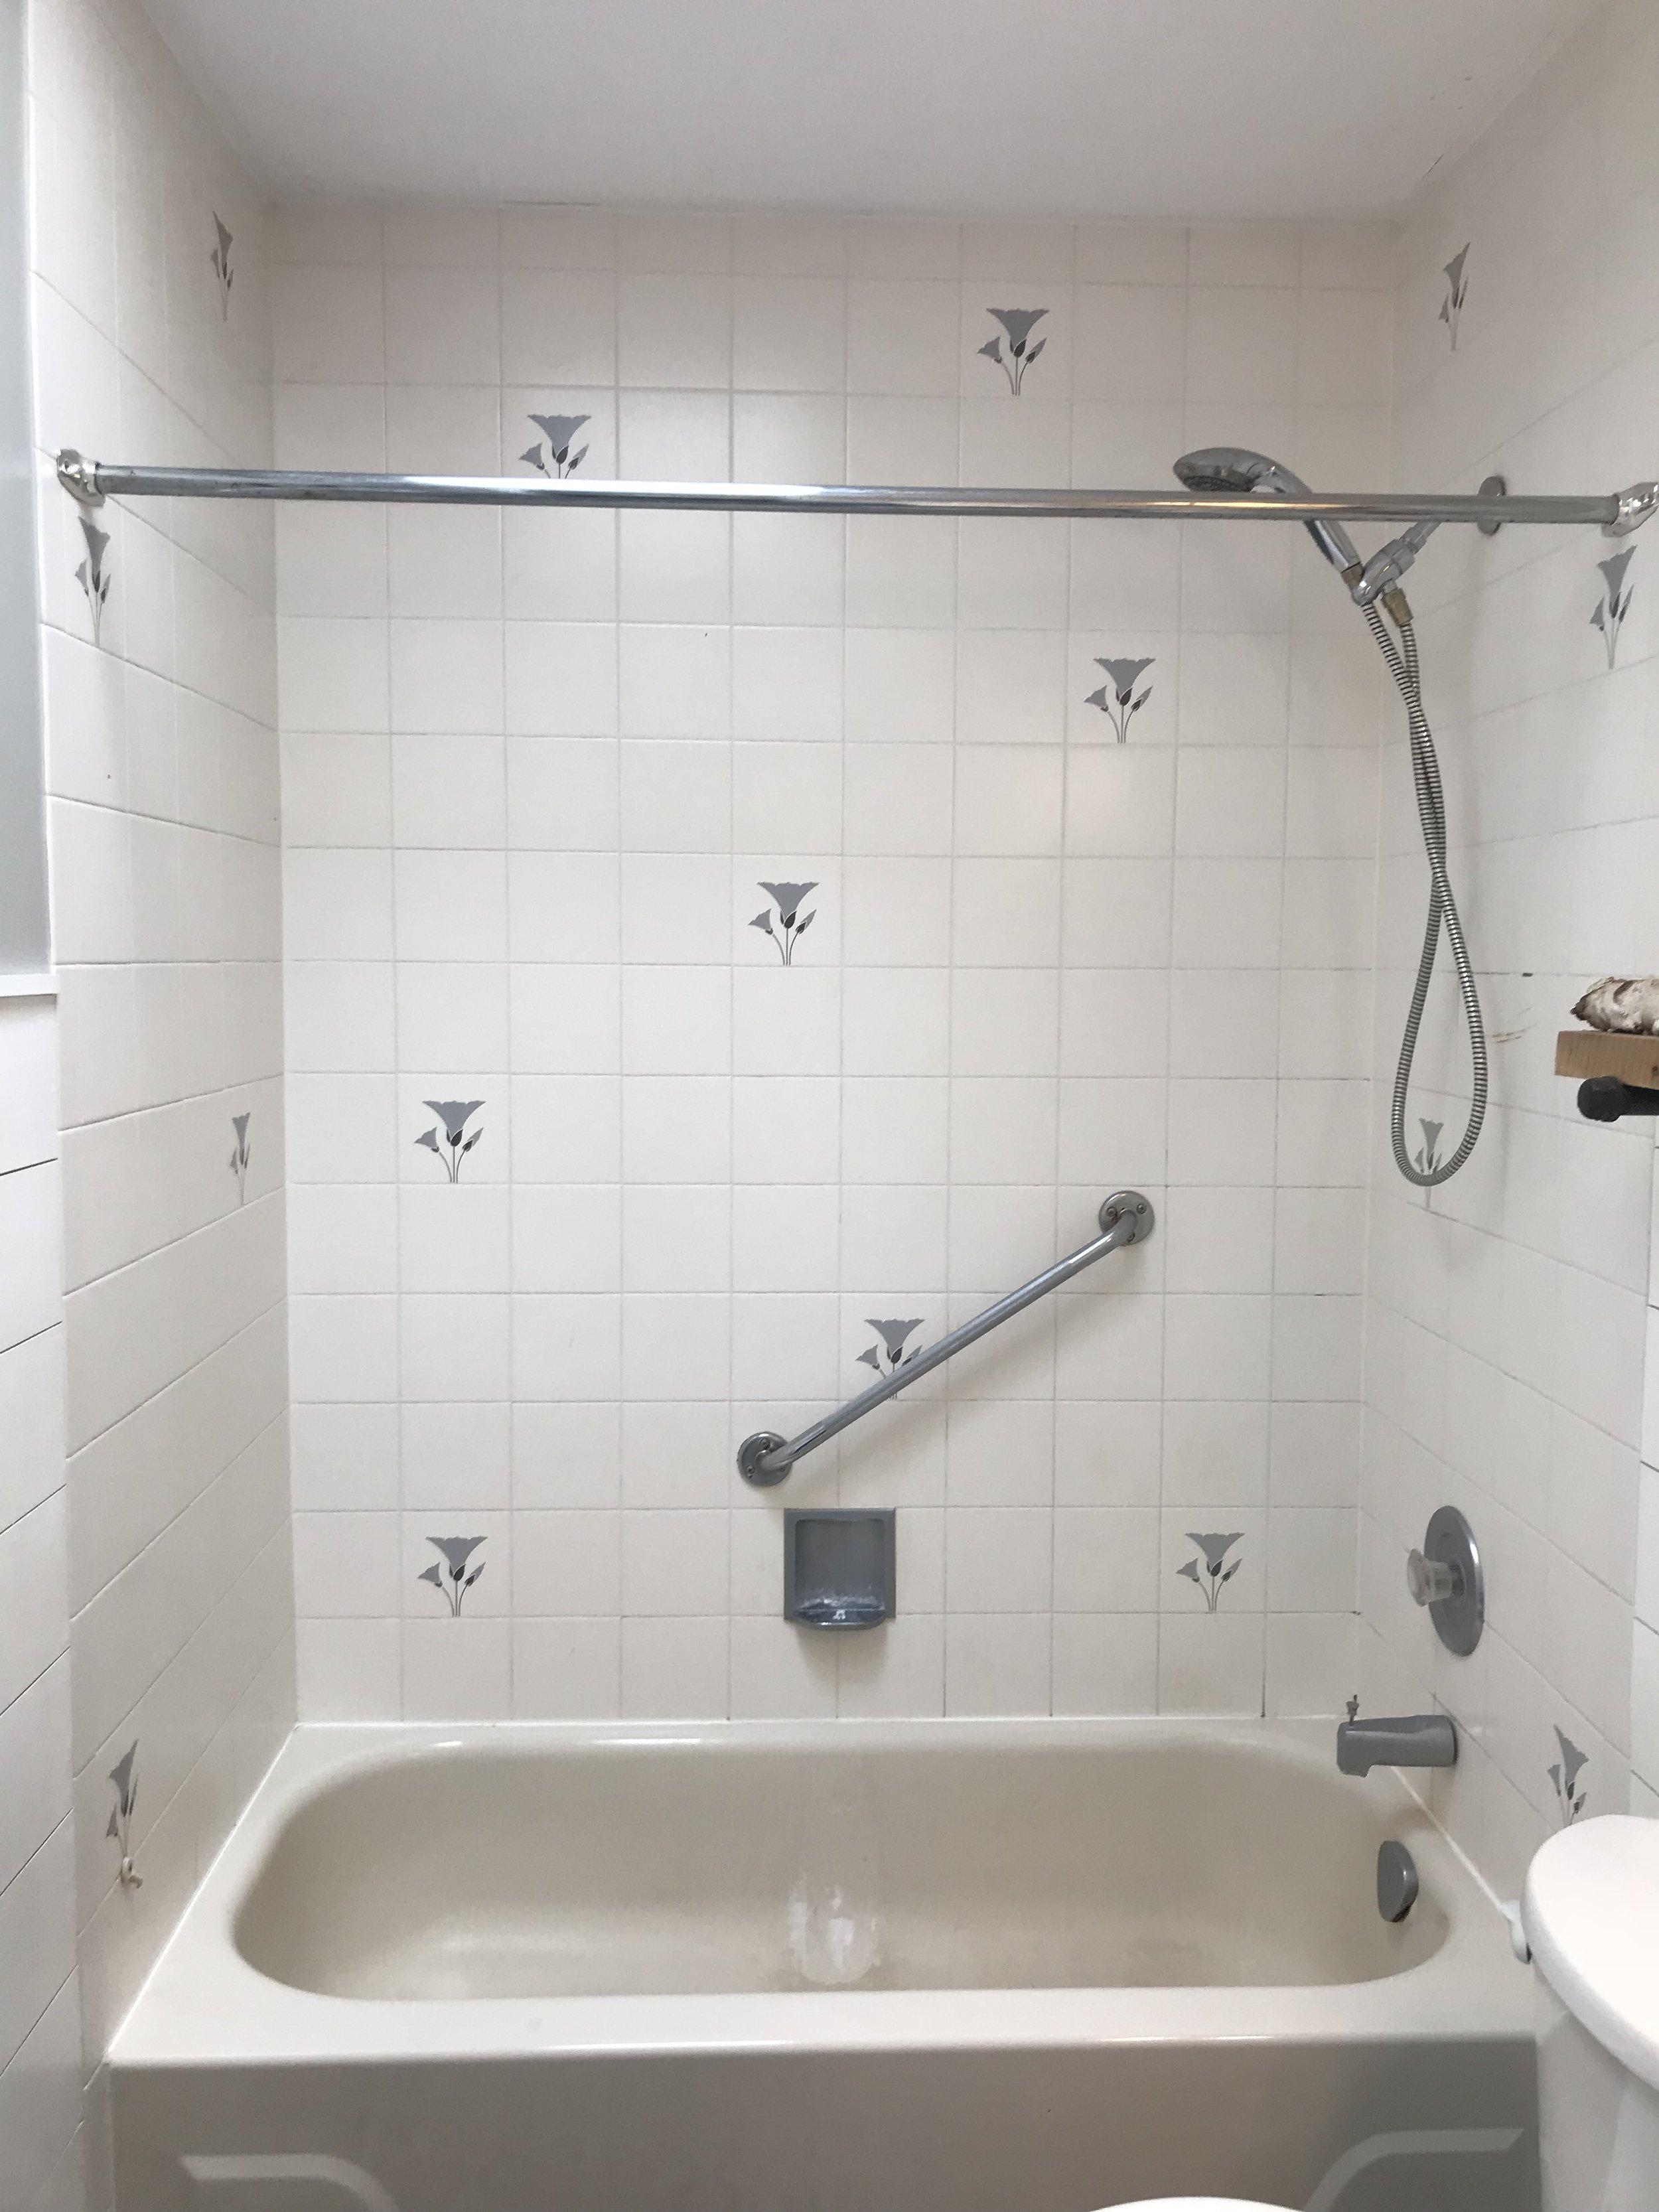 refinished bathroom tub tile the